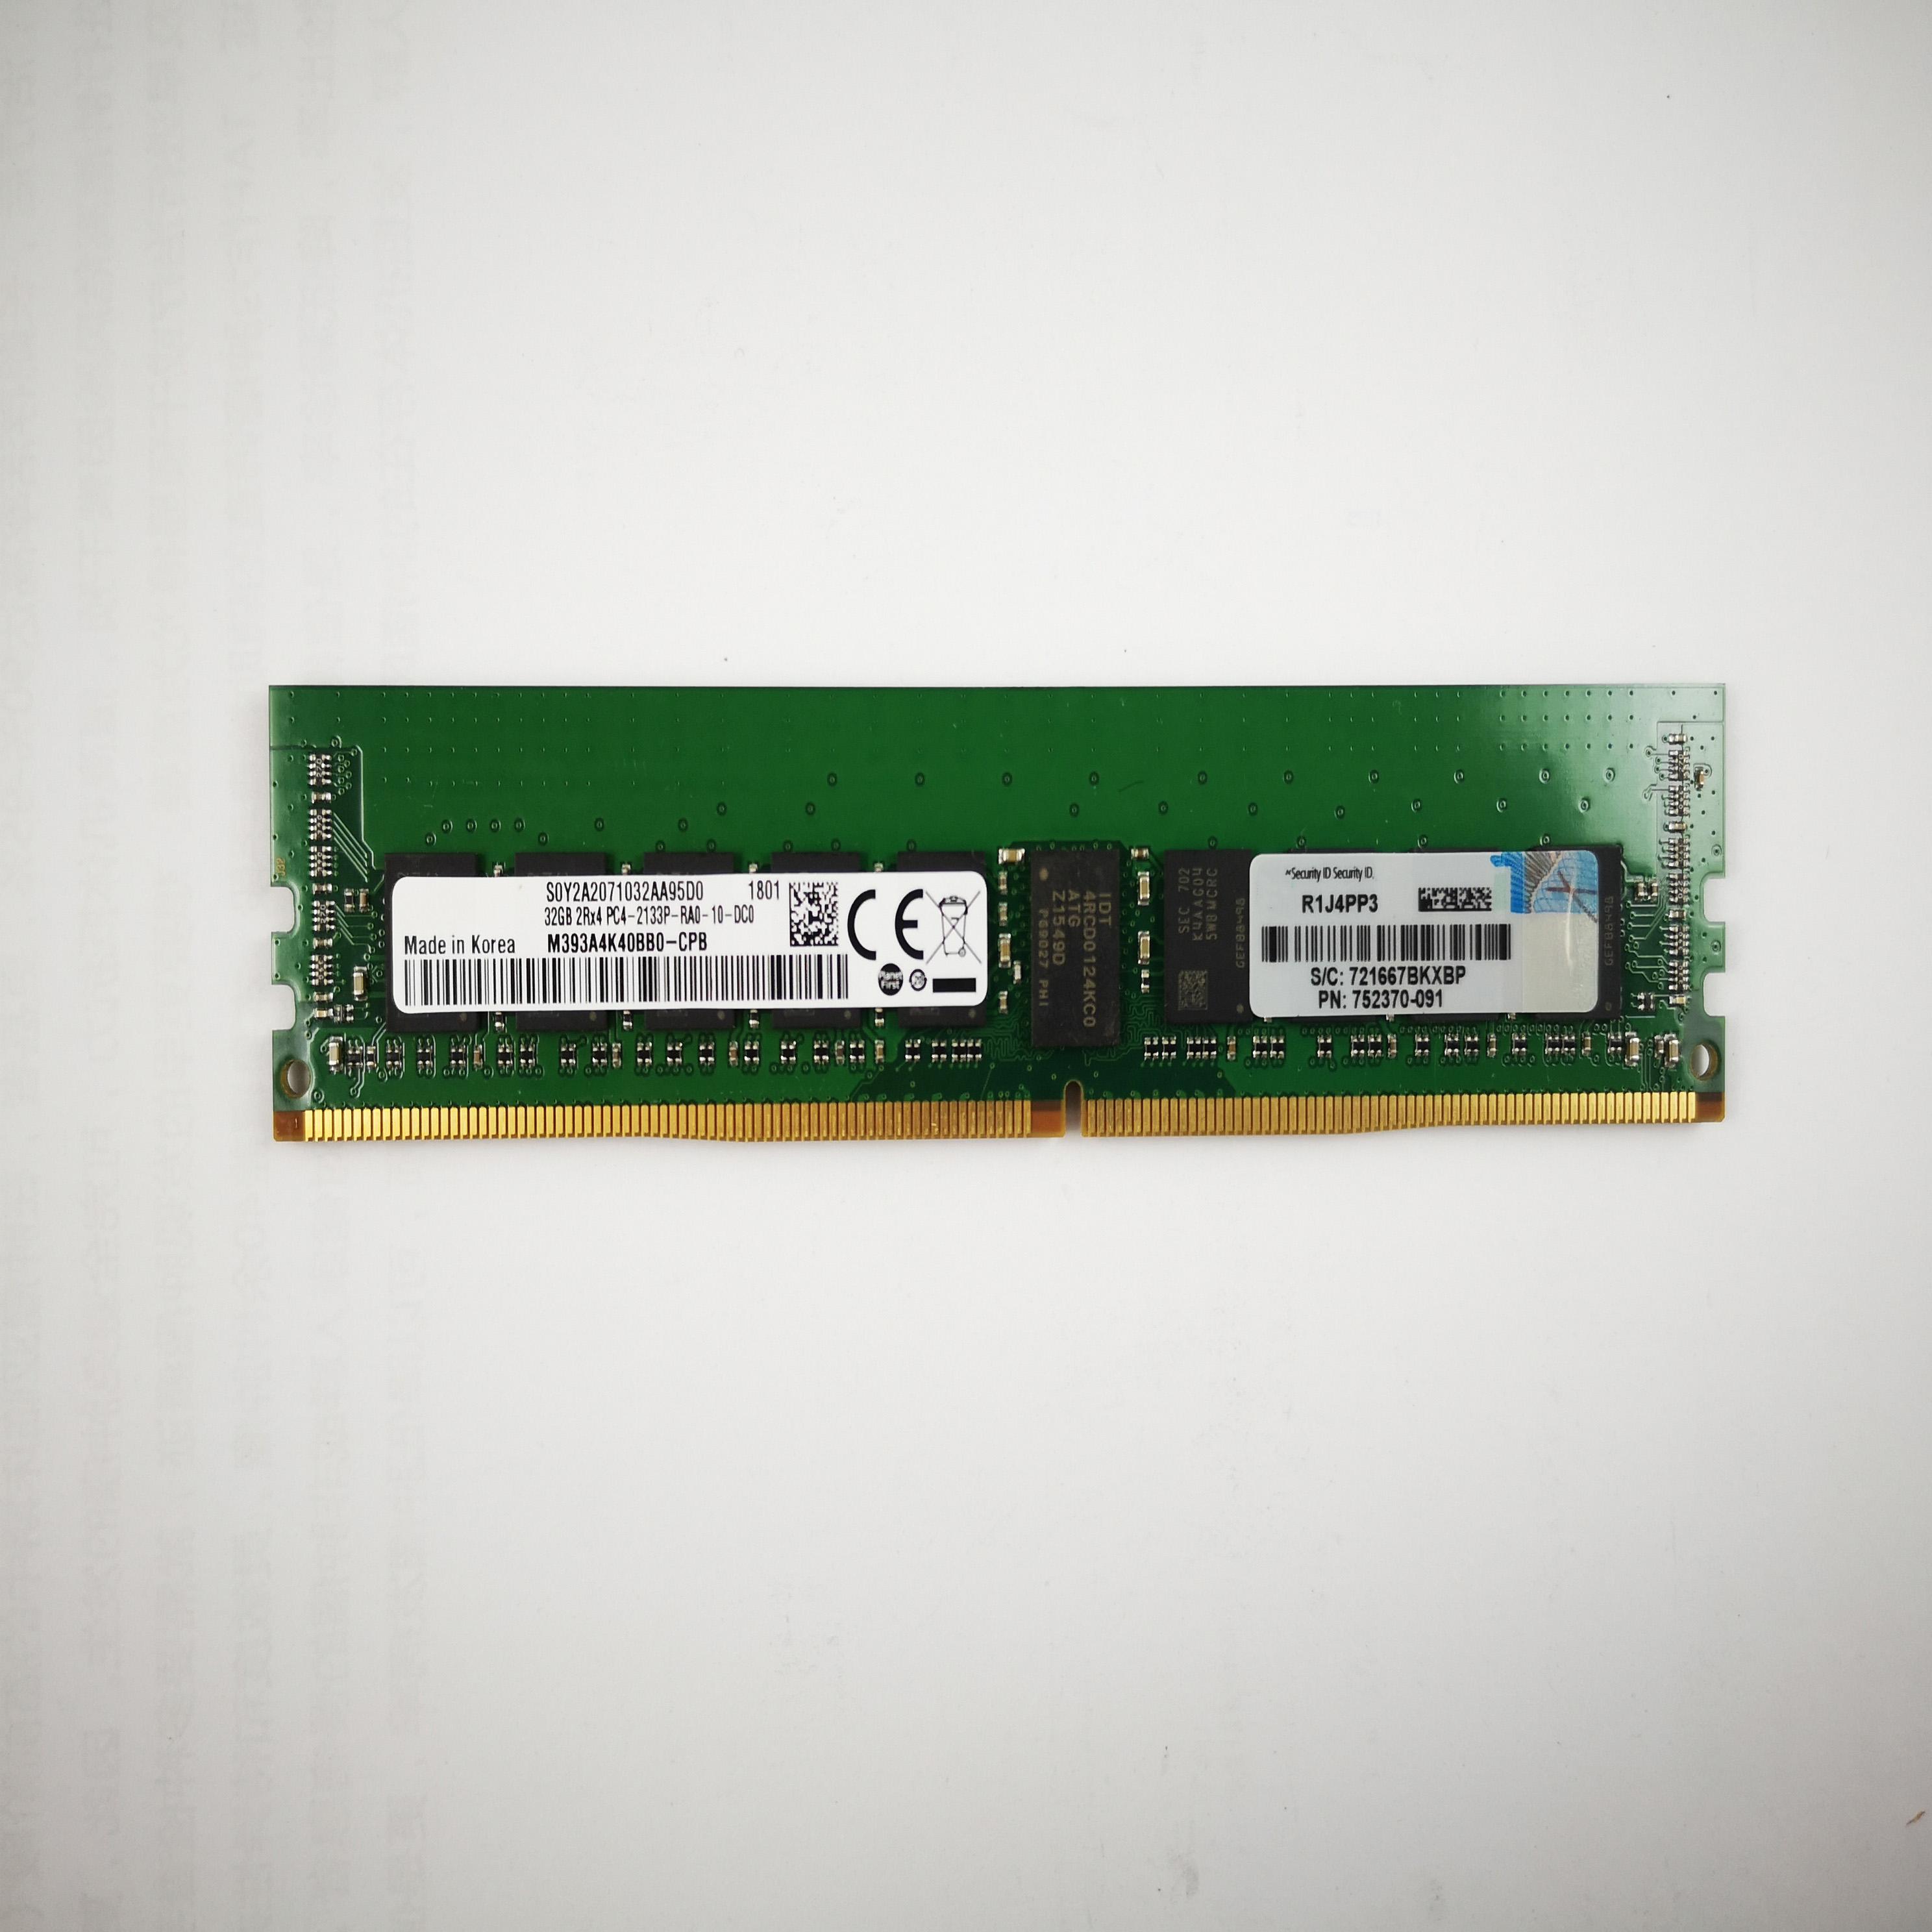 HP 628975-081 32GB PC3L-8500 DDR3-1066 LRDIMM 4Rx4 1.35V MEMORY